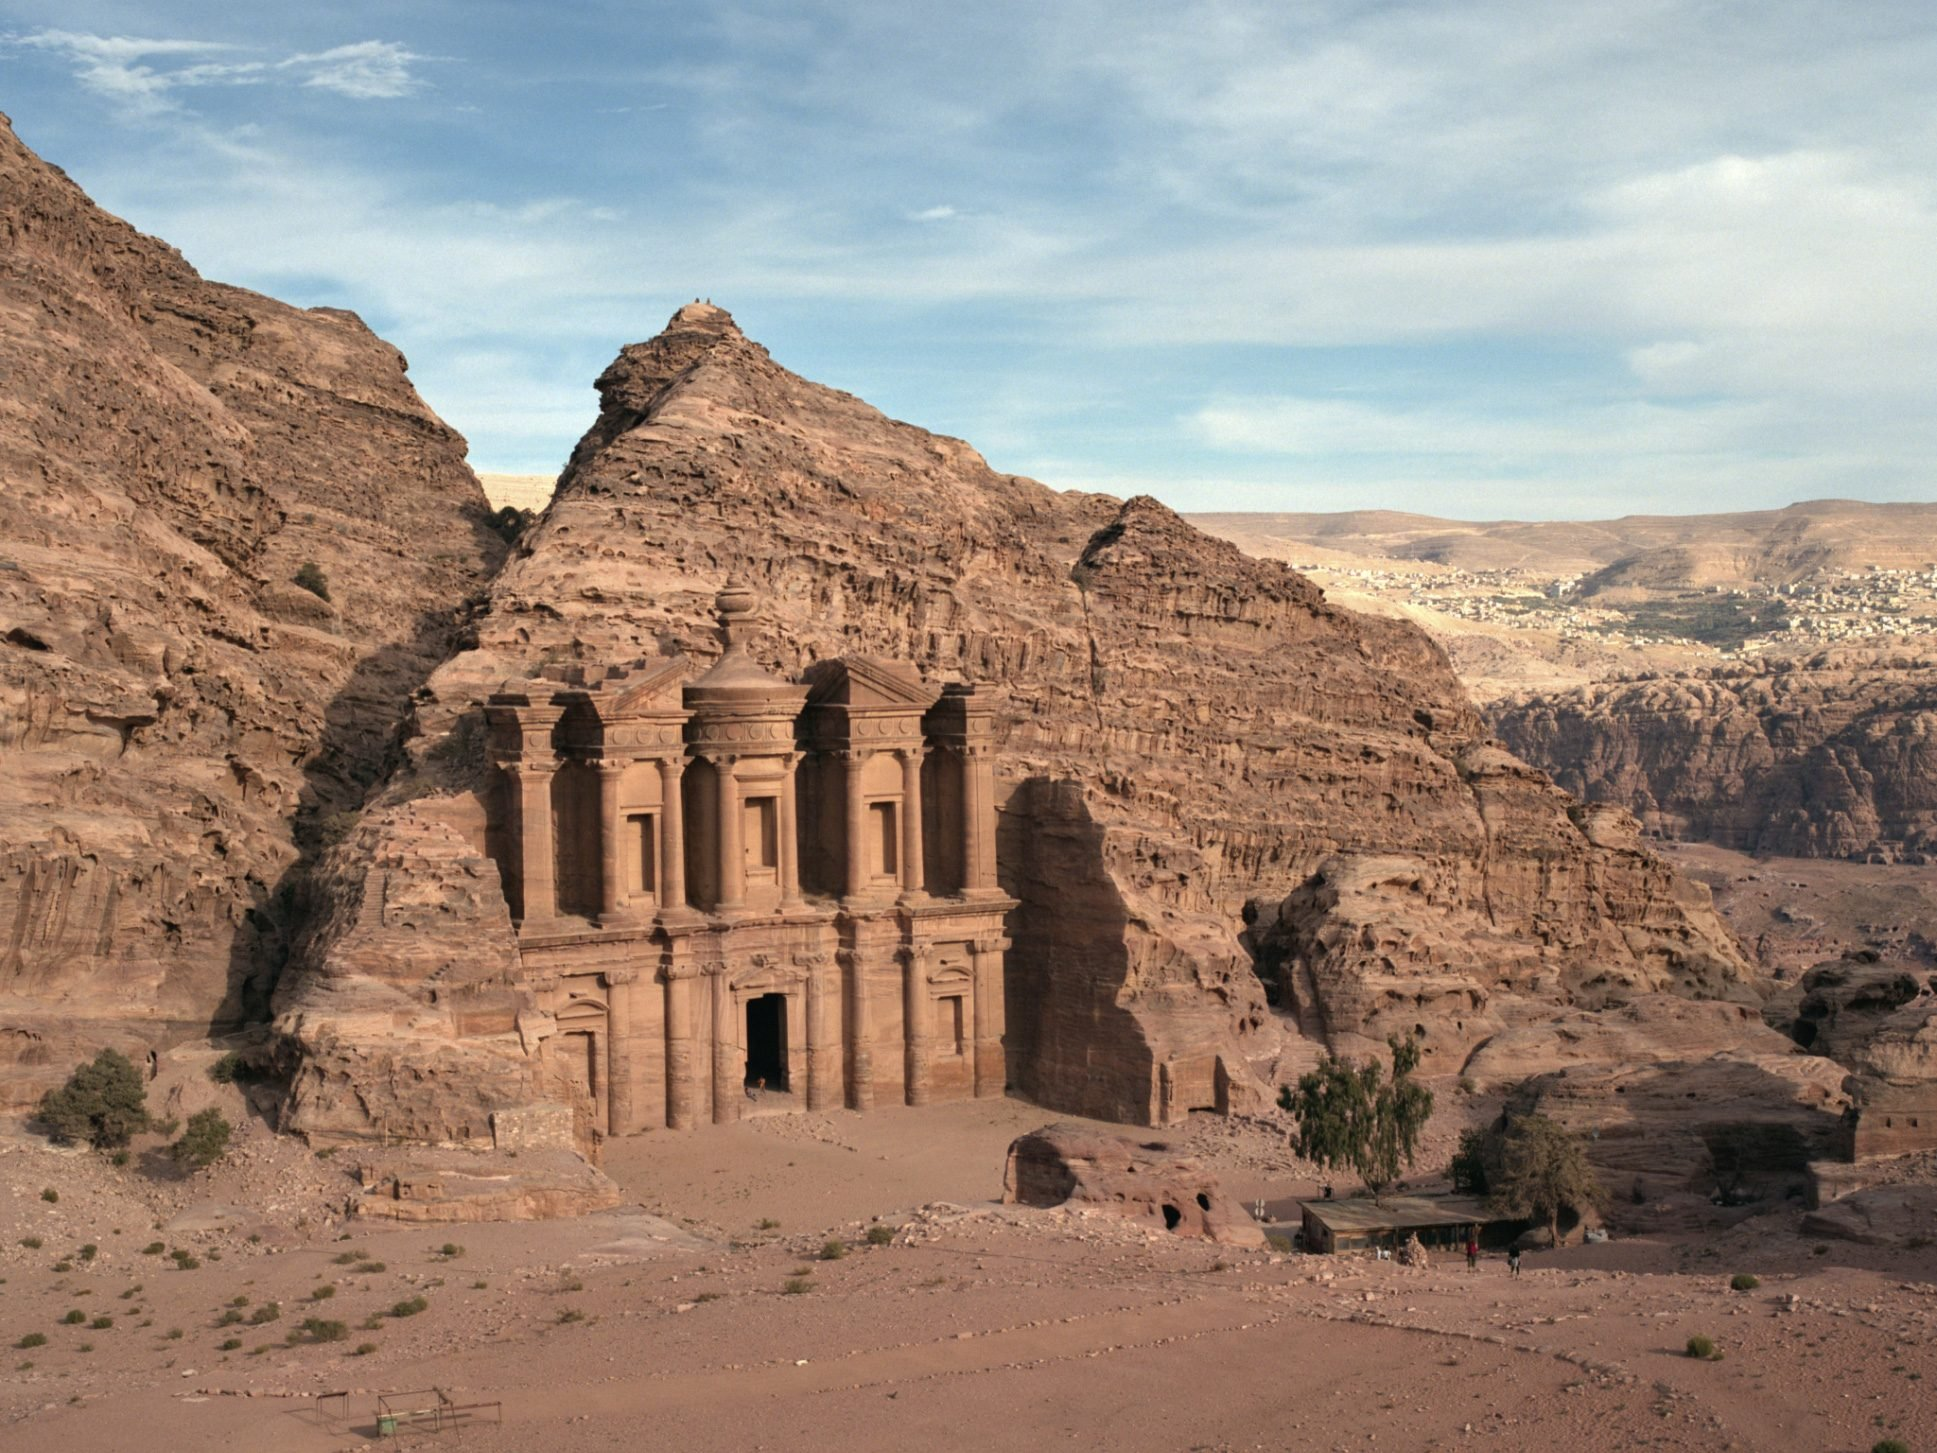 Greatest Historical Achitectural Achievments: Al Khazneh - Petra, Jordan